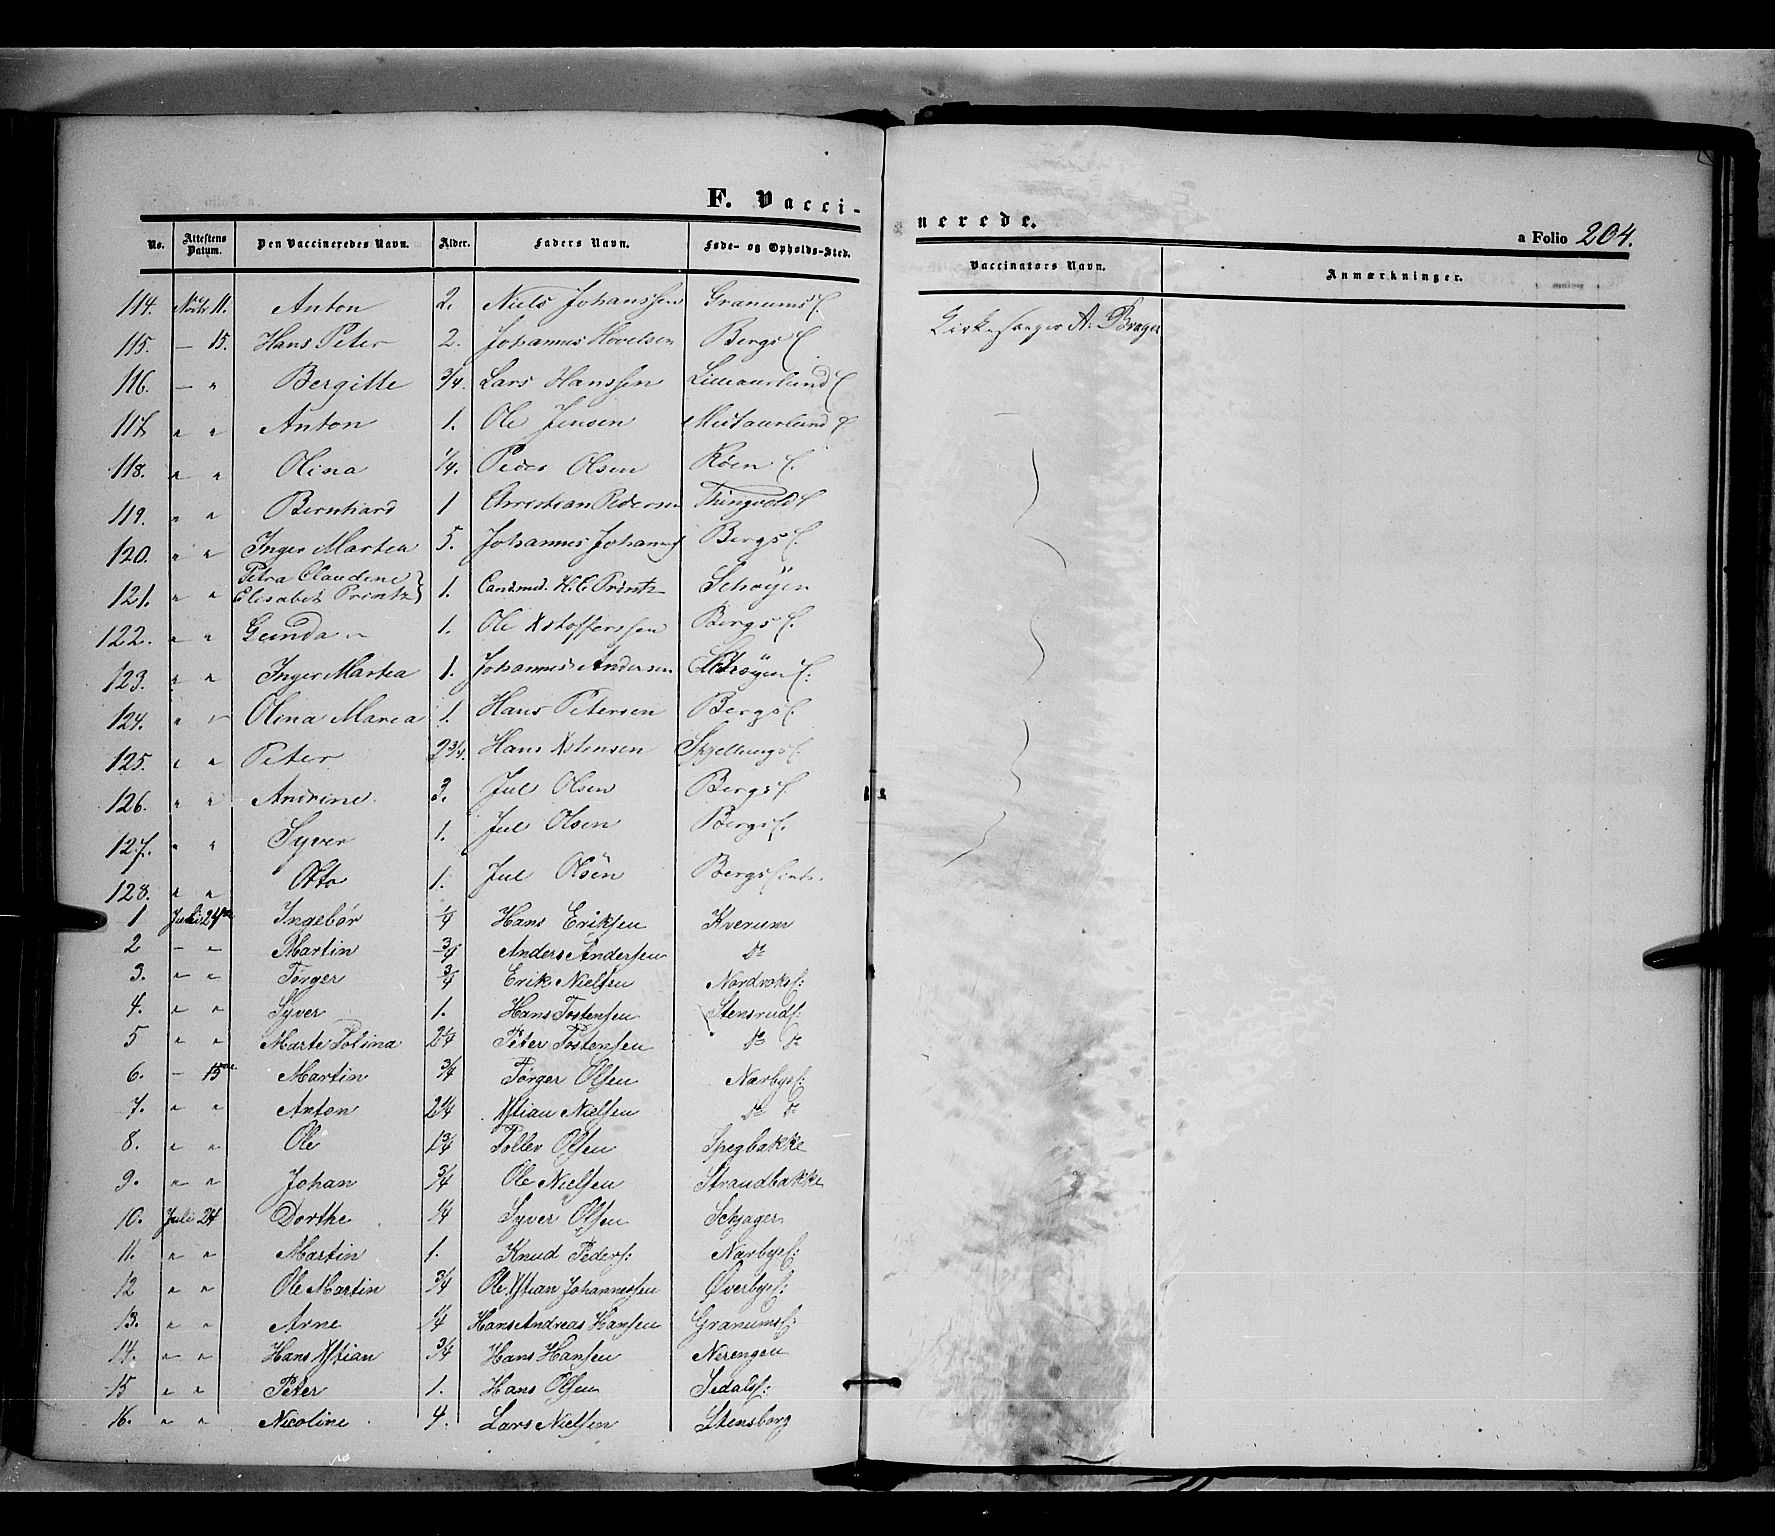 SAH, Land prestekontor, Ministerialbok nr. 9, 1847-1859, s. 204